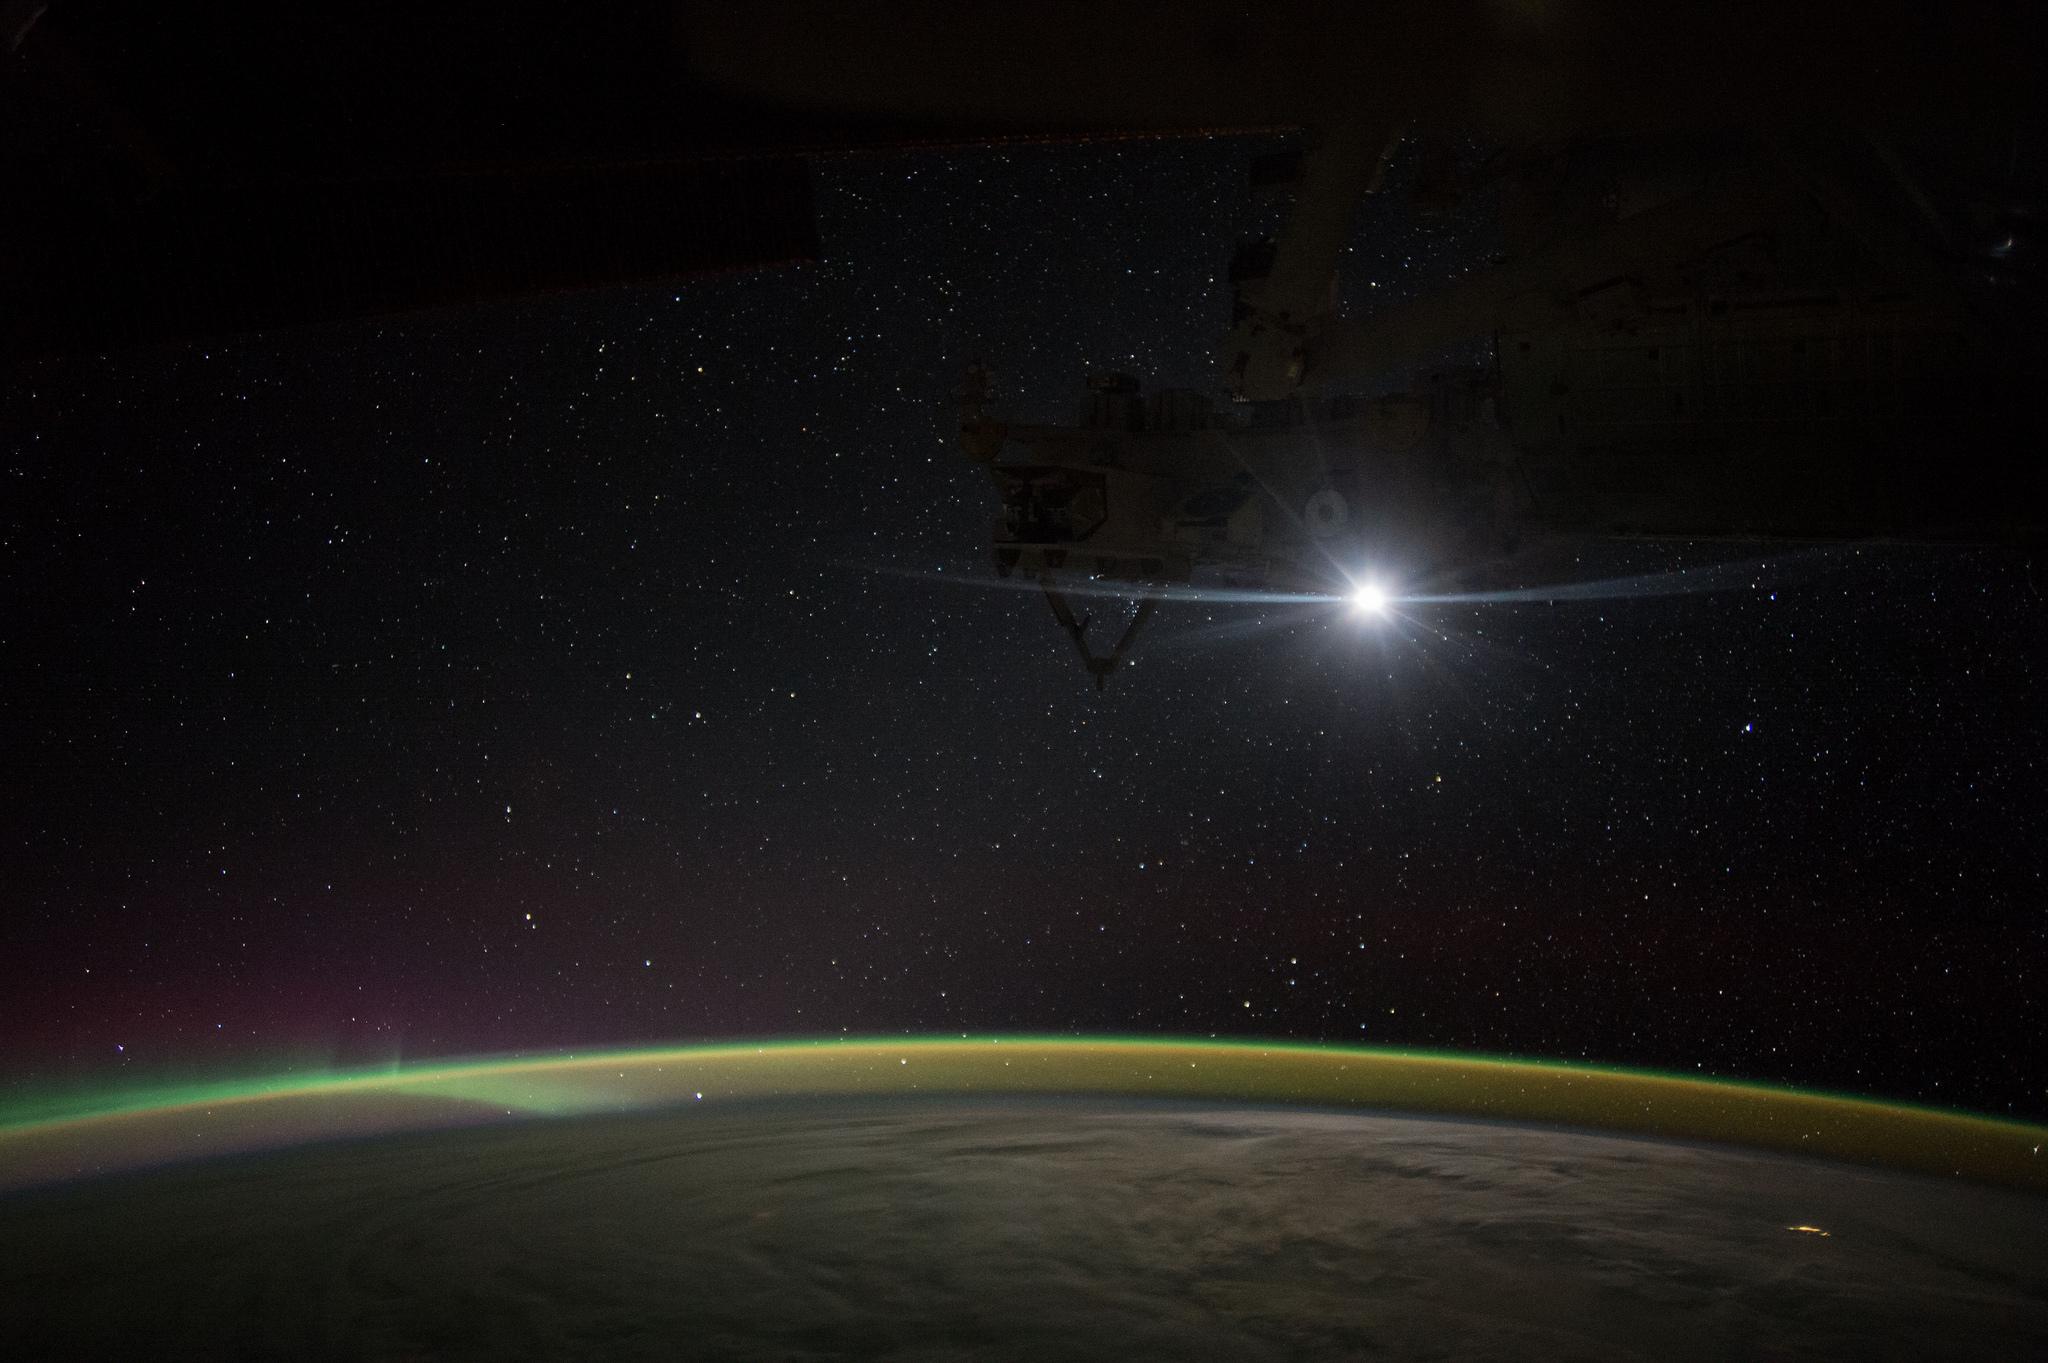 Moonrise on the International Space Station, taken by NASA astronaut Kate Rubins.